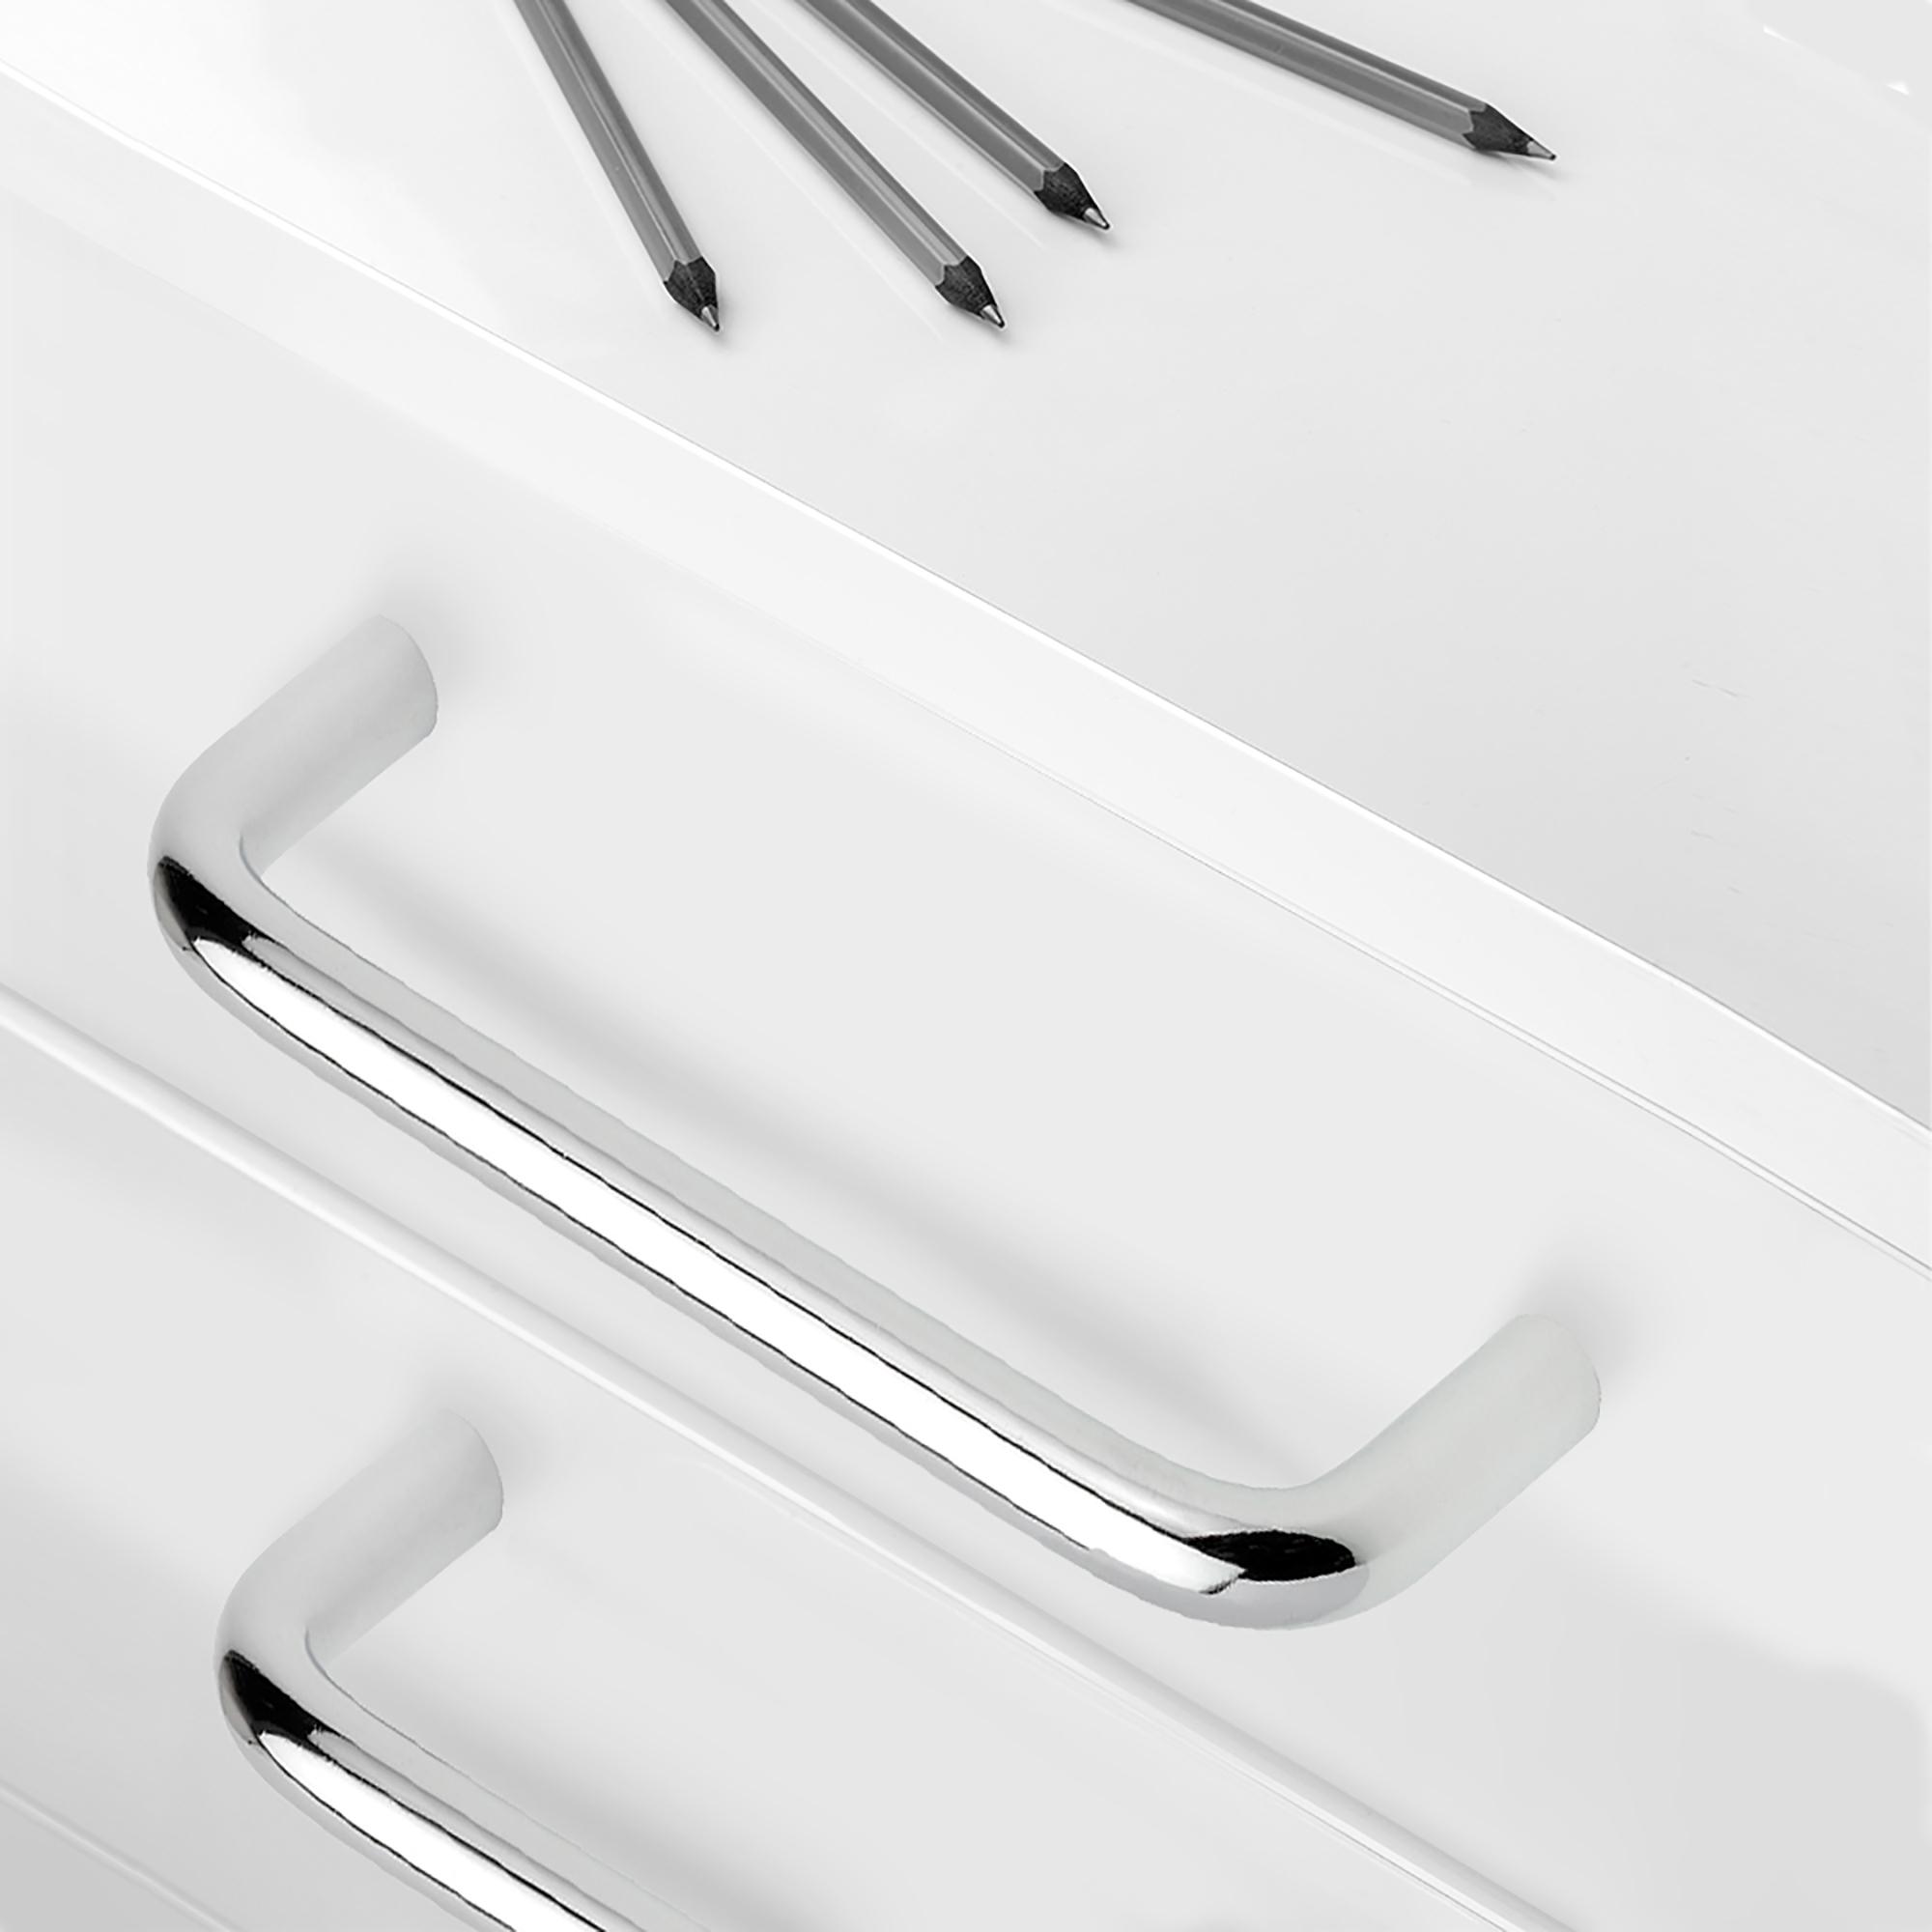 Emuca Maniglie per mobile, D. 8 mm, interasse 96 mm, Acciaio, Cromo opaco